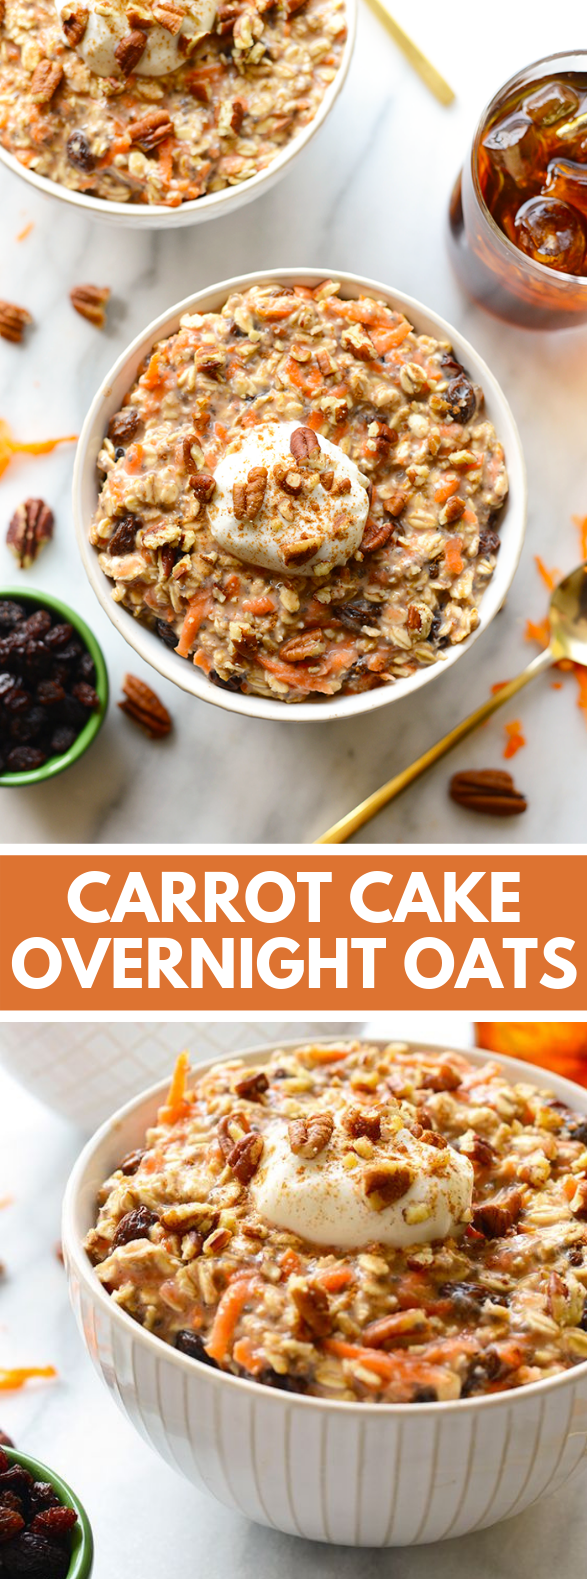 CARROT CAKE OVERNIGHT OATS #breakfast #healthty